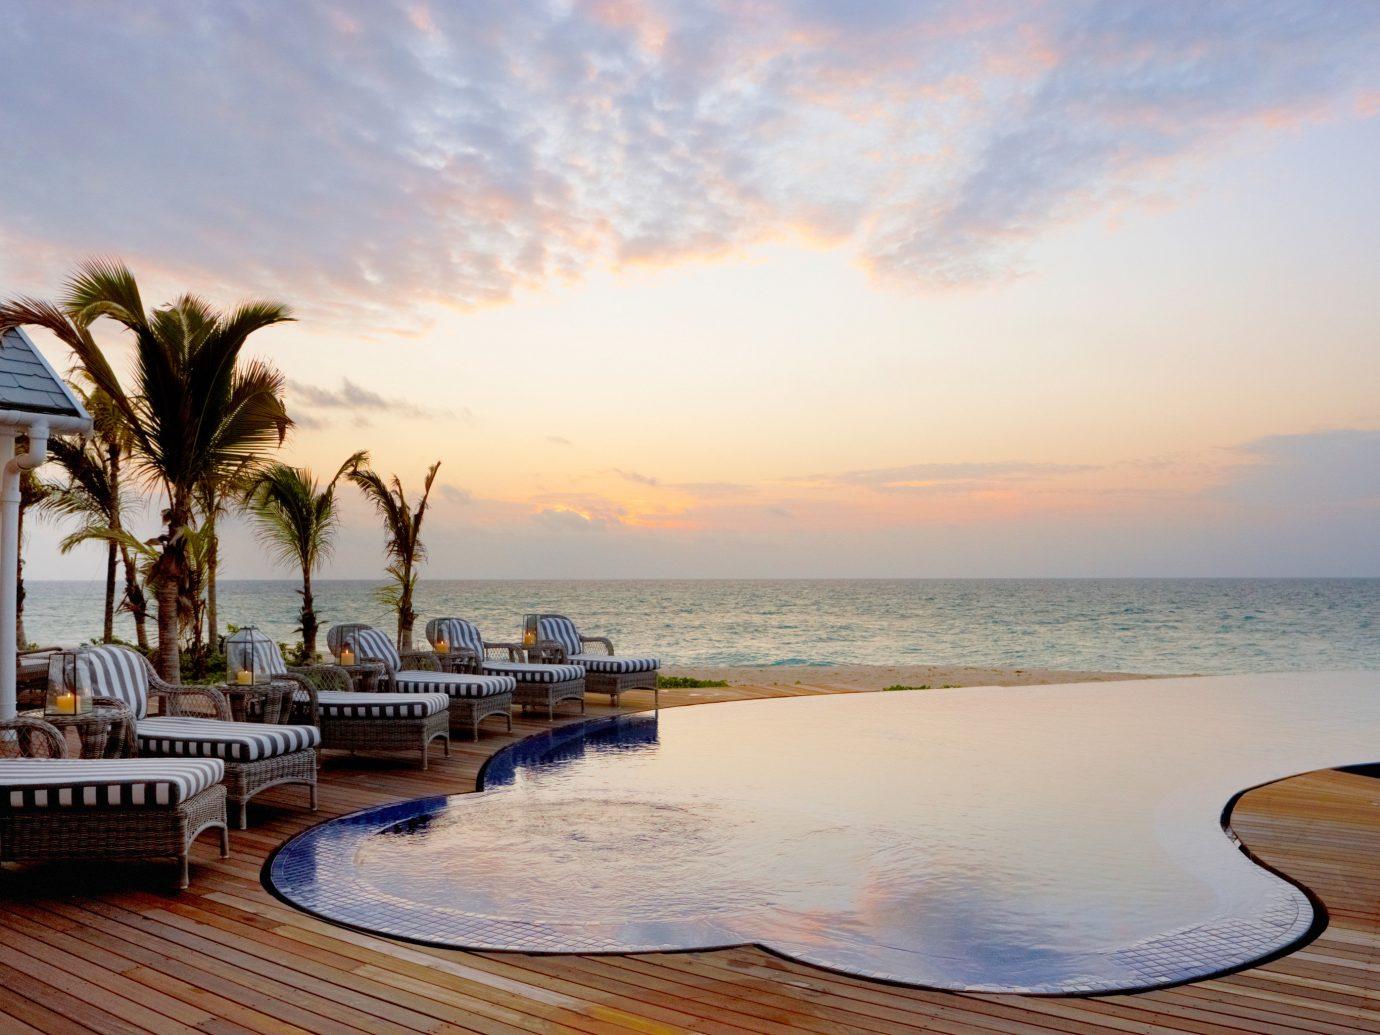 Honeymoon Hotels Luxury Travel Romance Trip Ideas outdoor water sky Sea shore Ocean vacation horizon Beach Sunset Coast morning evening bay dusk caribbean Resort sunrise